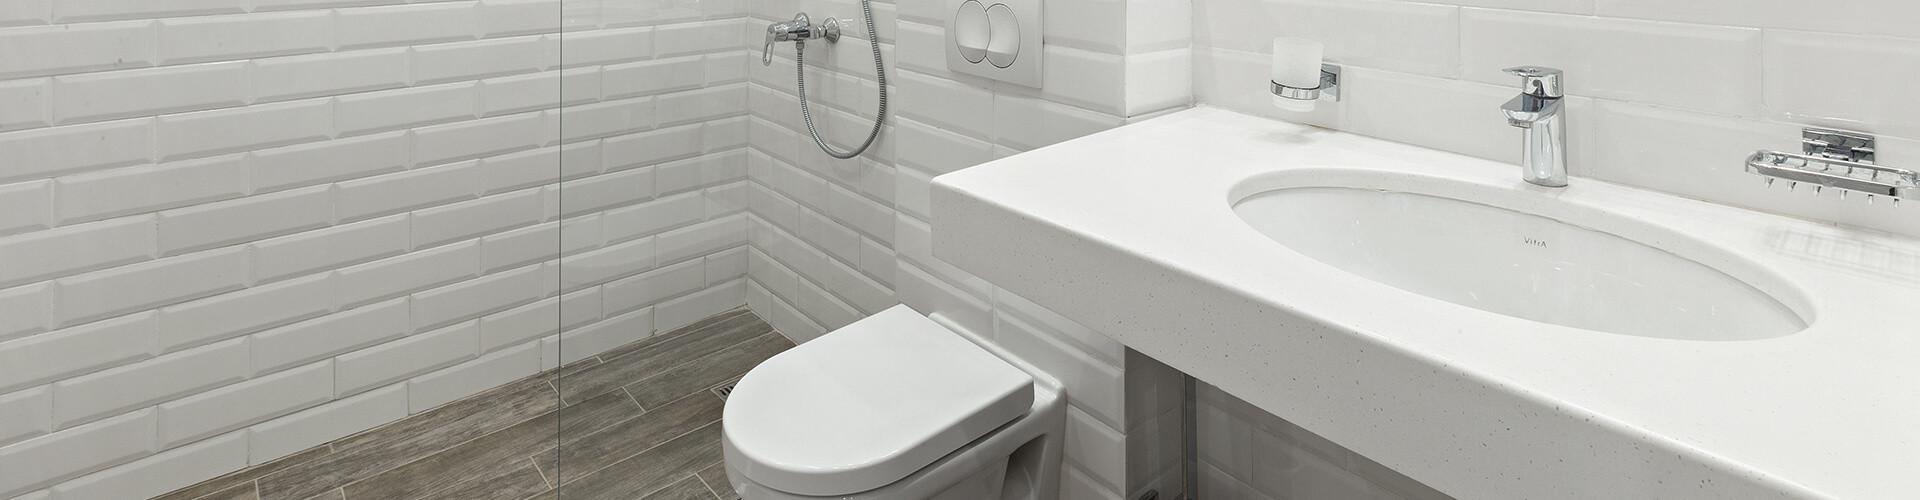 Anti slip coating voor gladde badkamer tegels